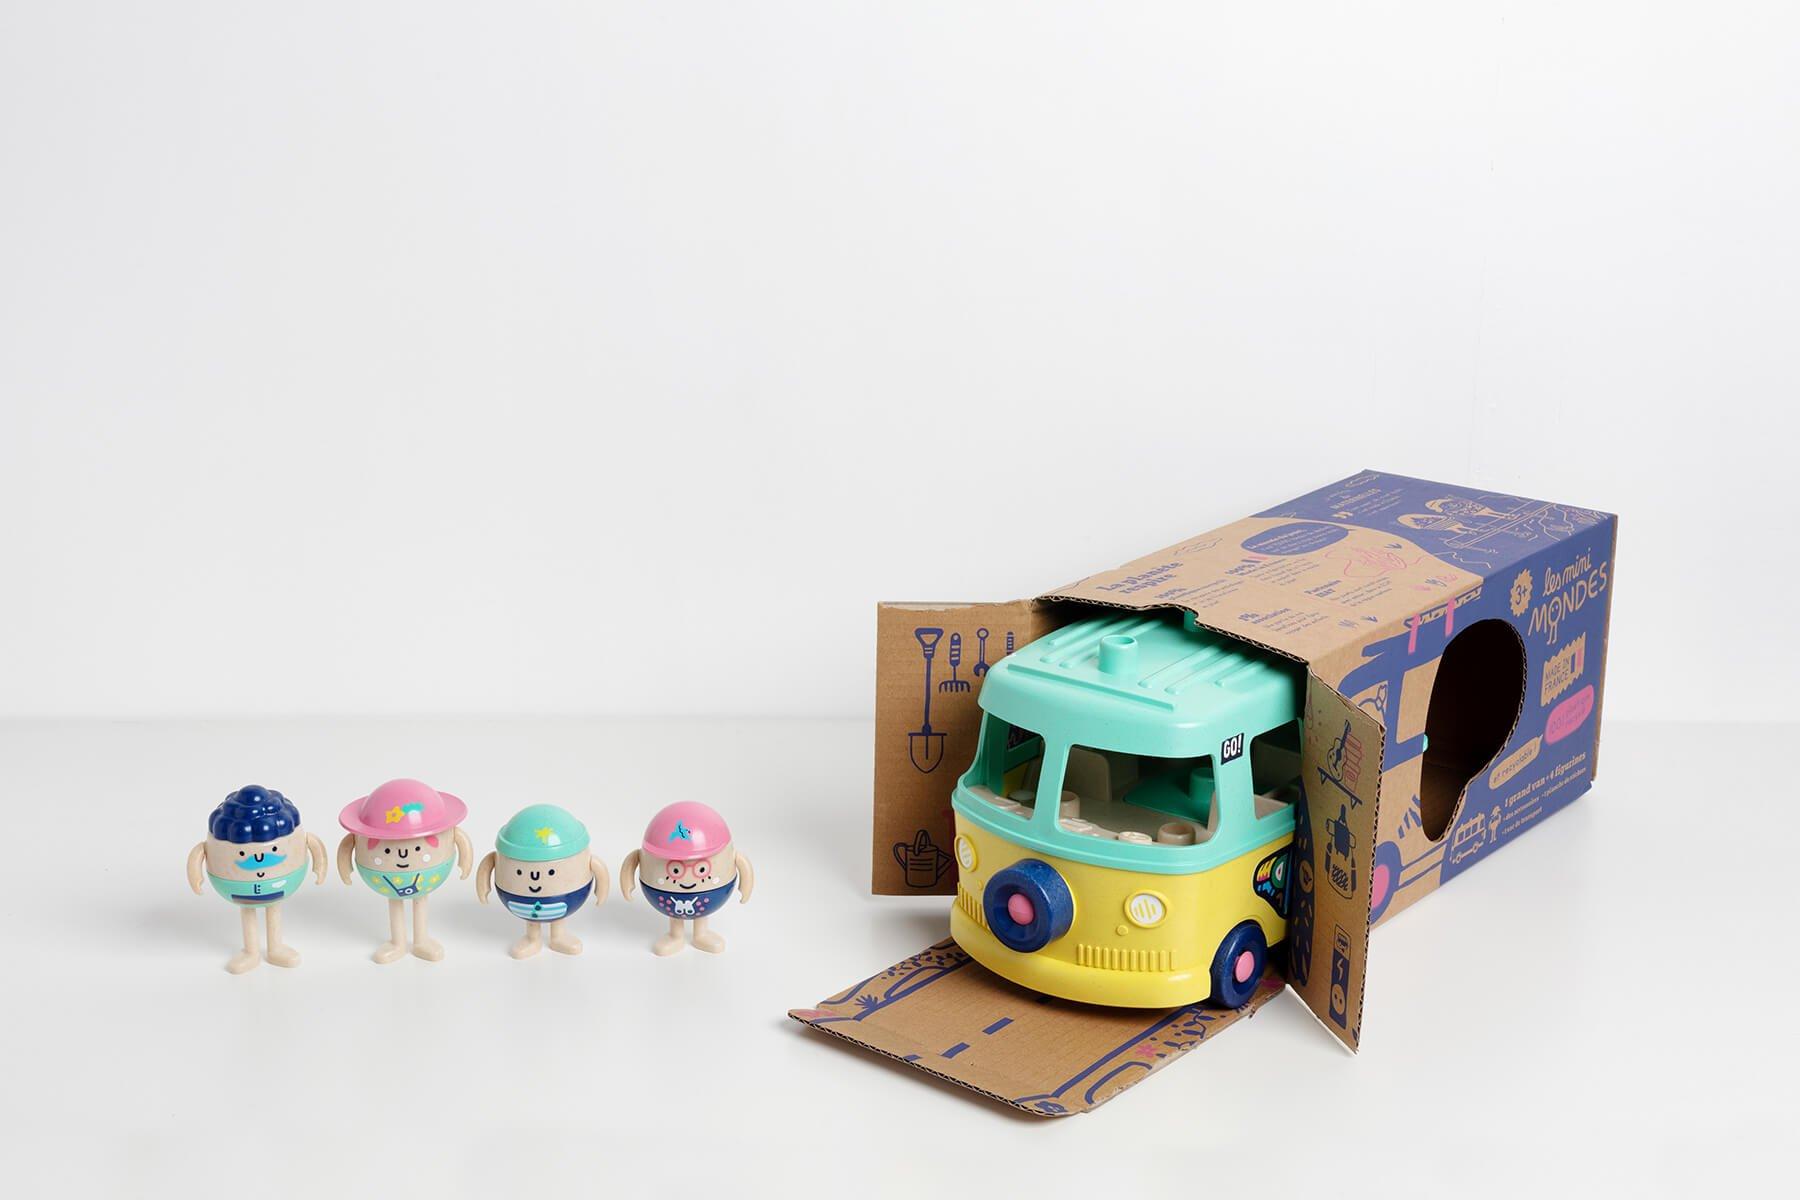 Jouet en plastique recyclé - Le van, notre jouet made in France